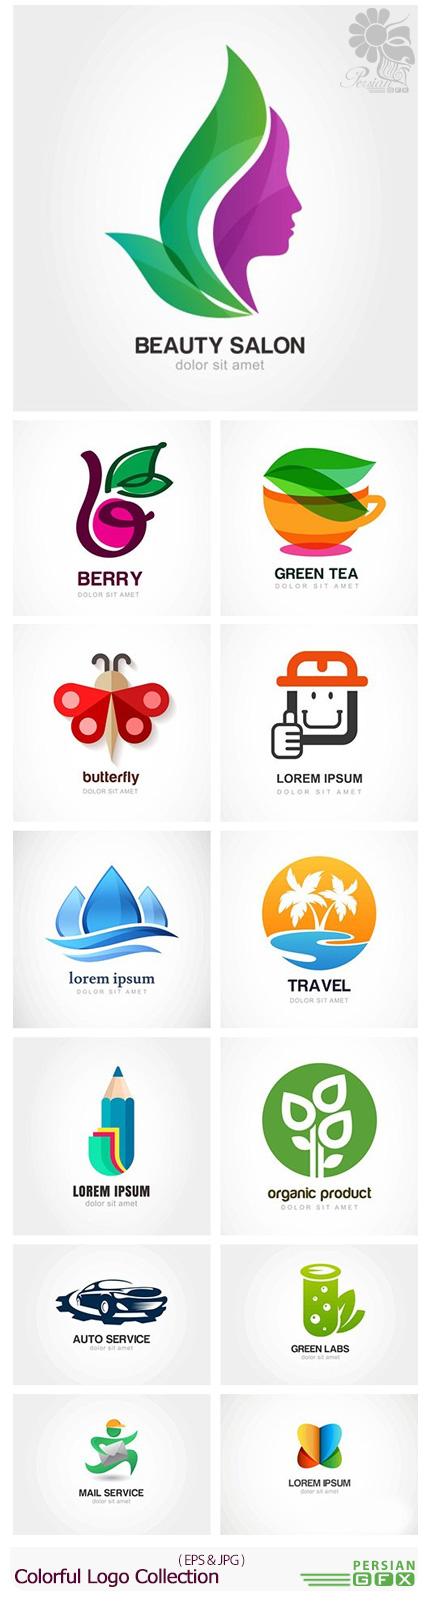 دانلود تصاویر وکتور آرم و لوگوی رنگارنگ - Colorful Logo Collection